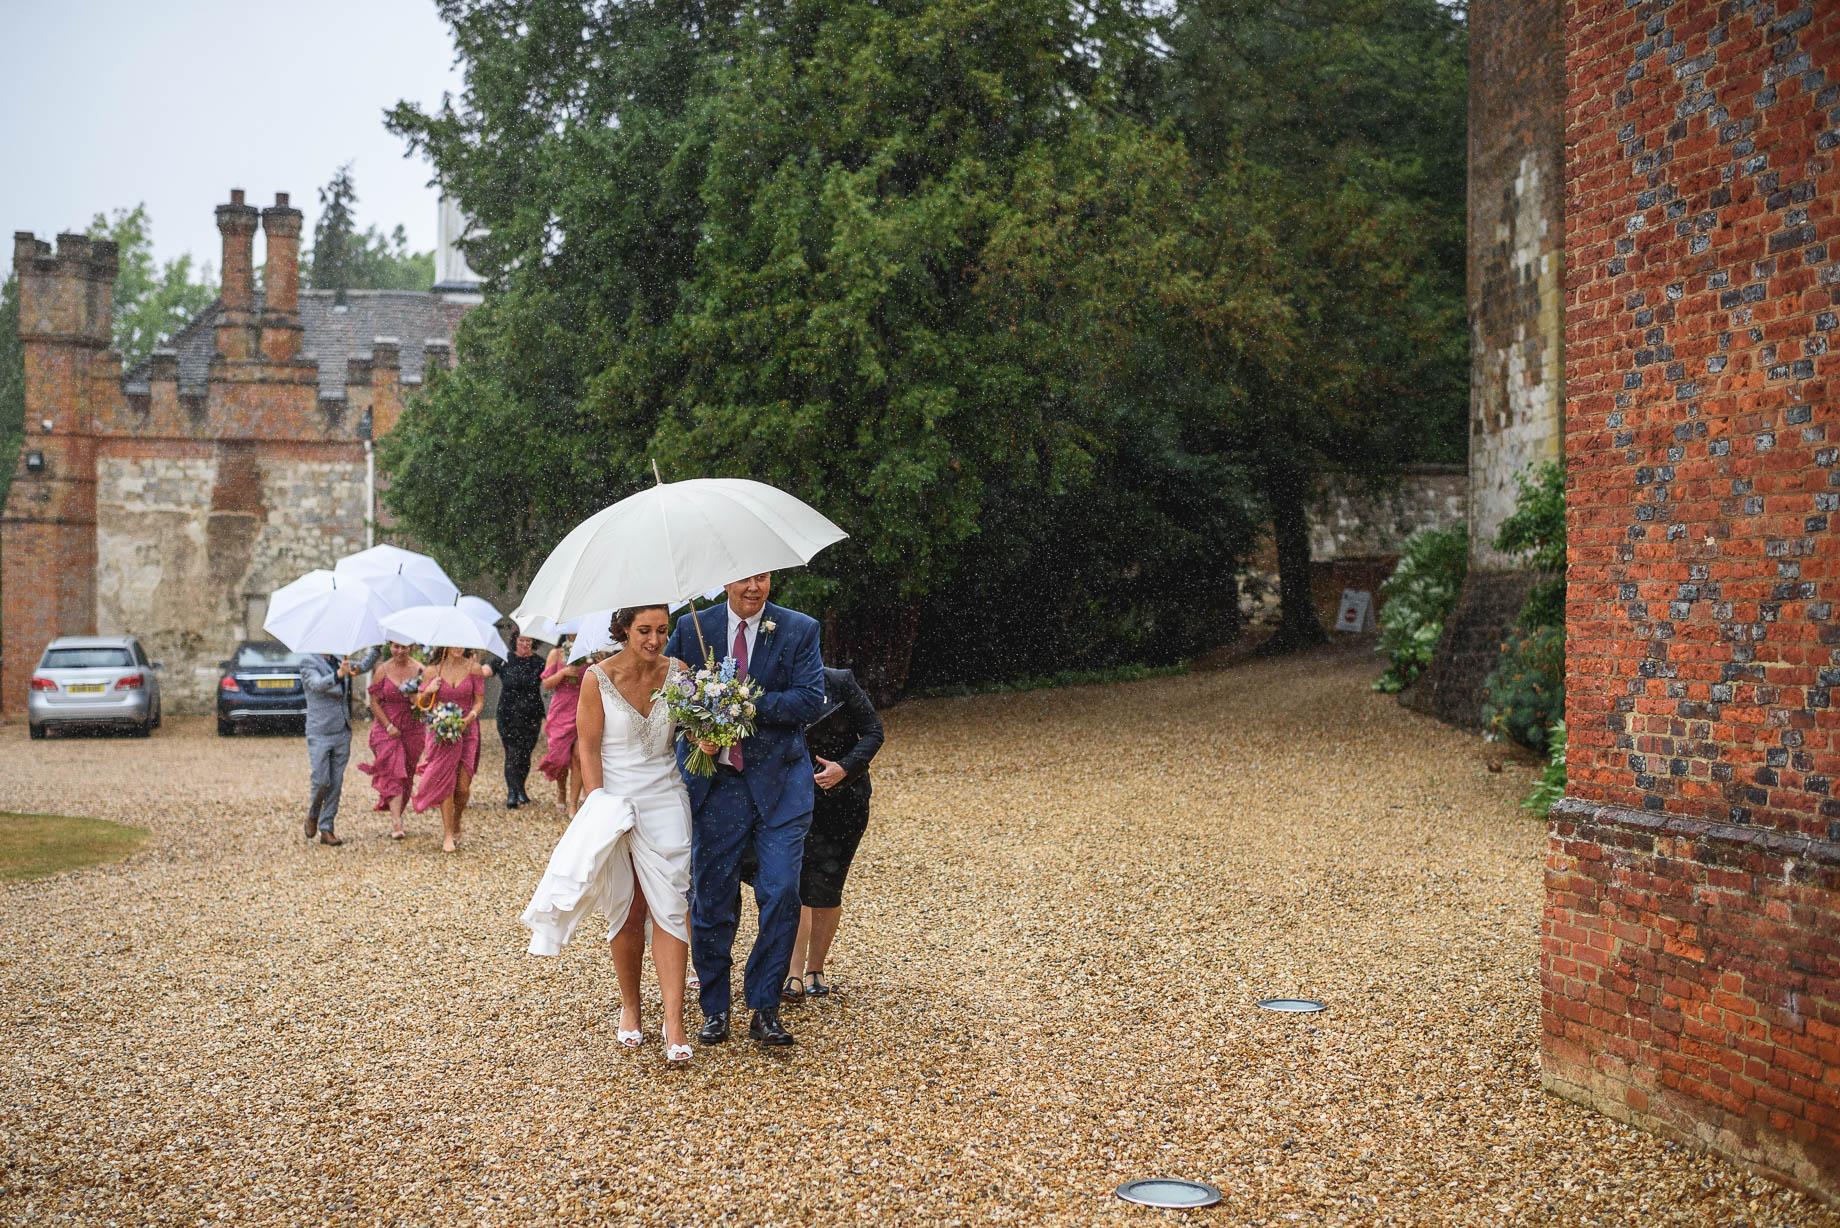 Farnham Castle wedding photography - Paulette + Laurence